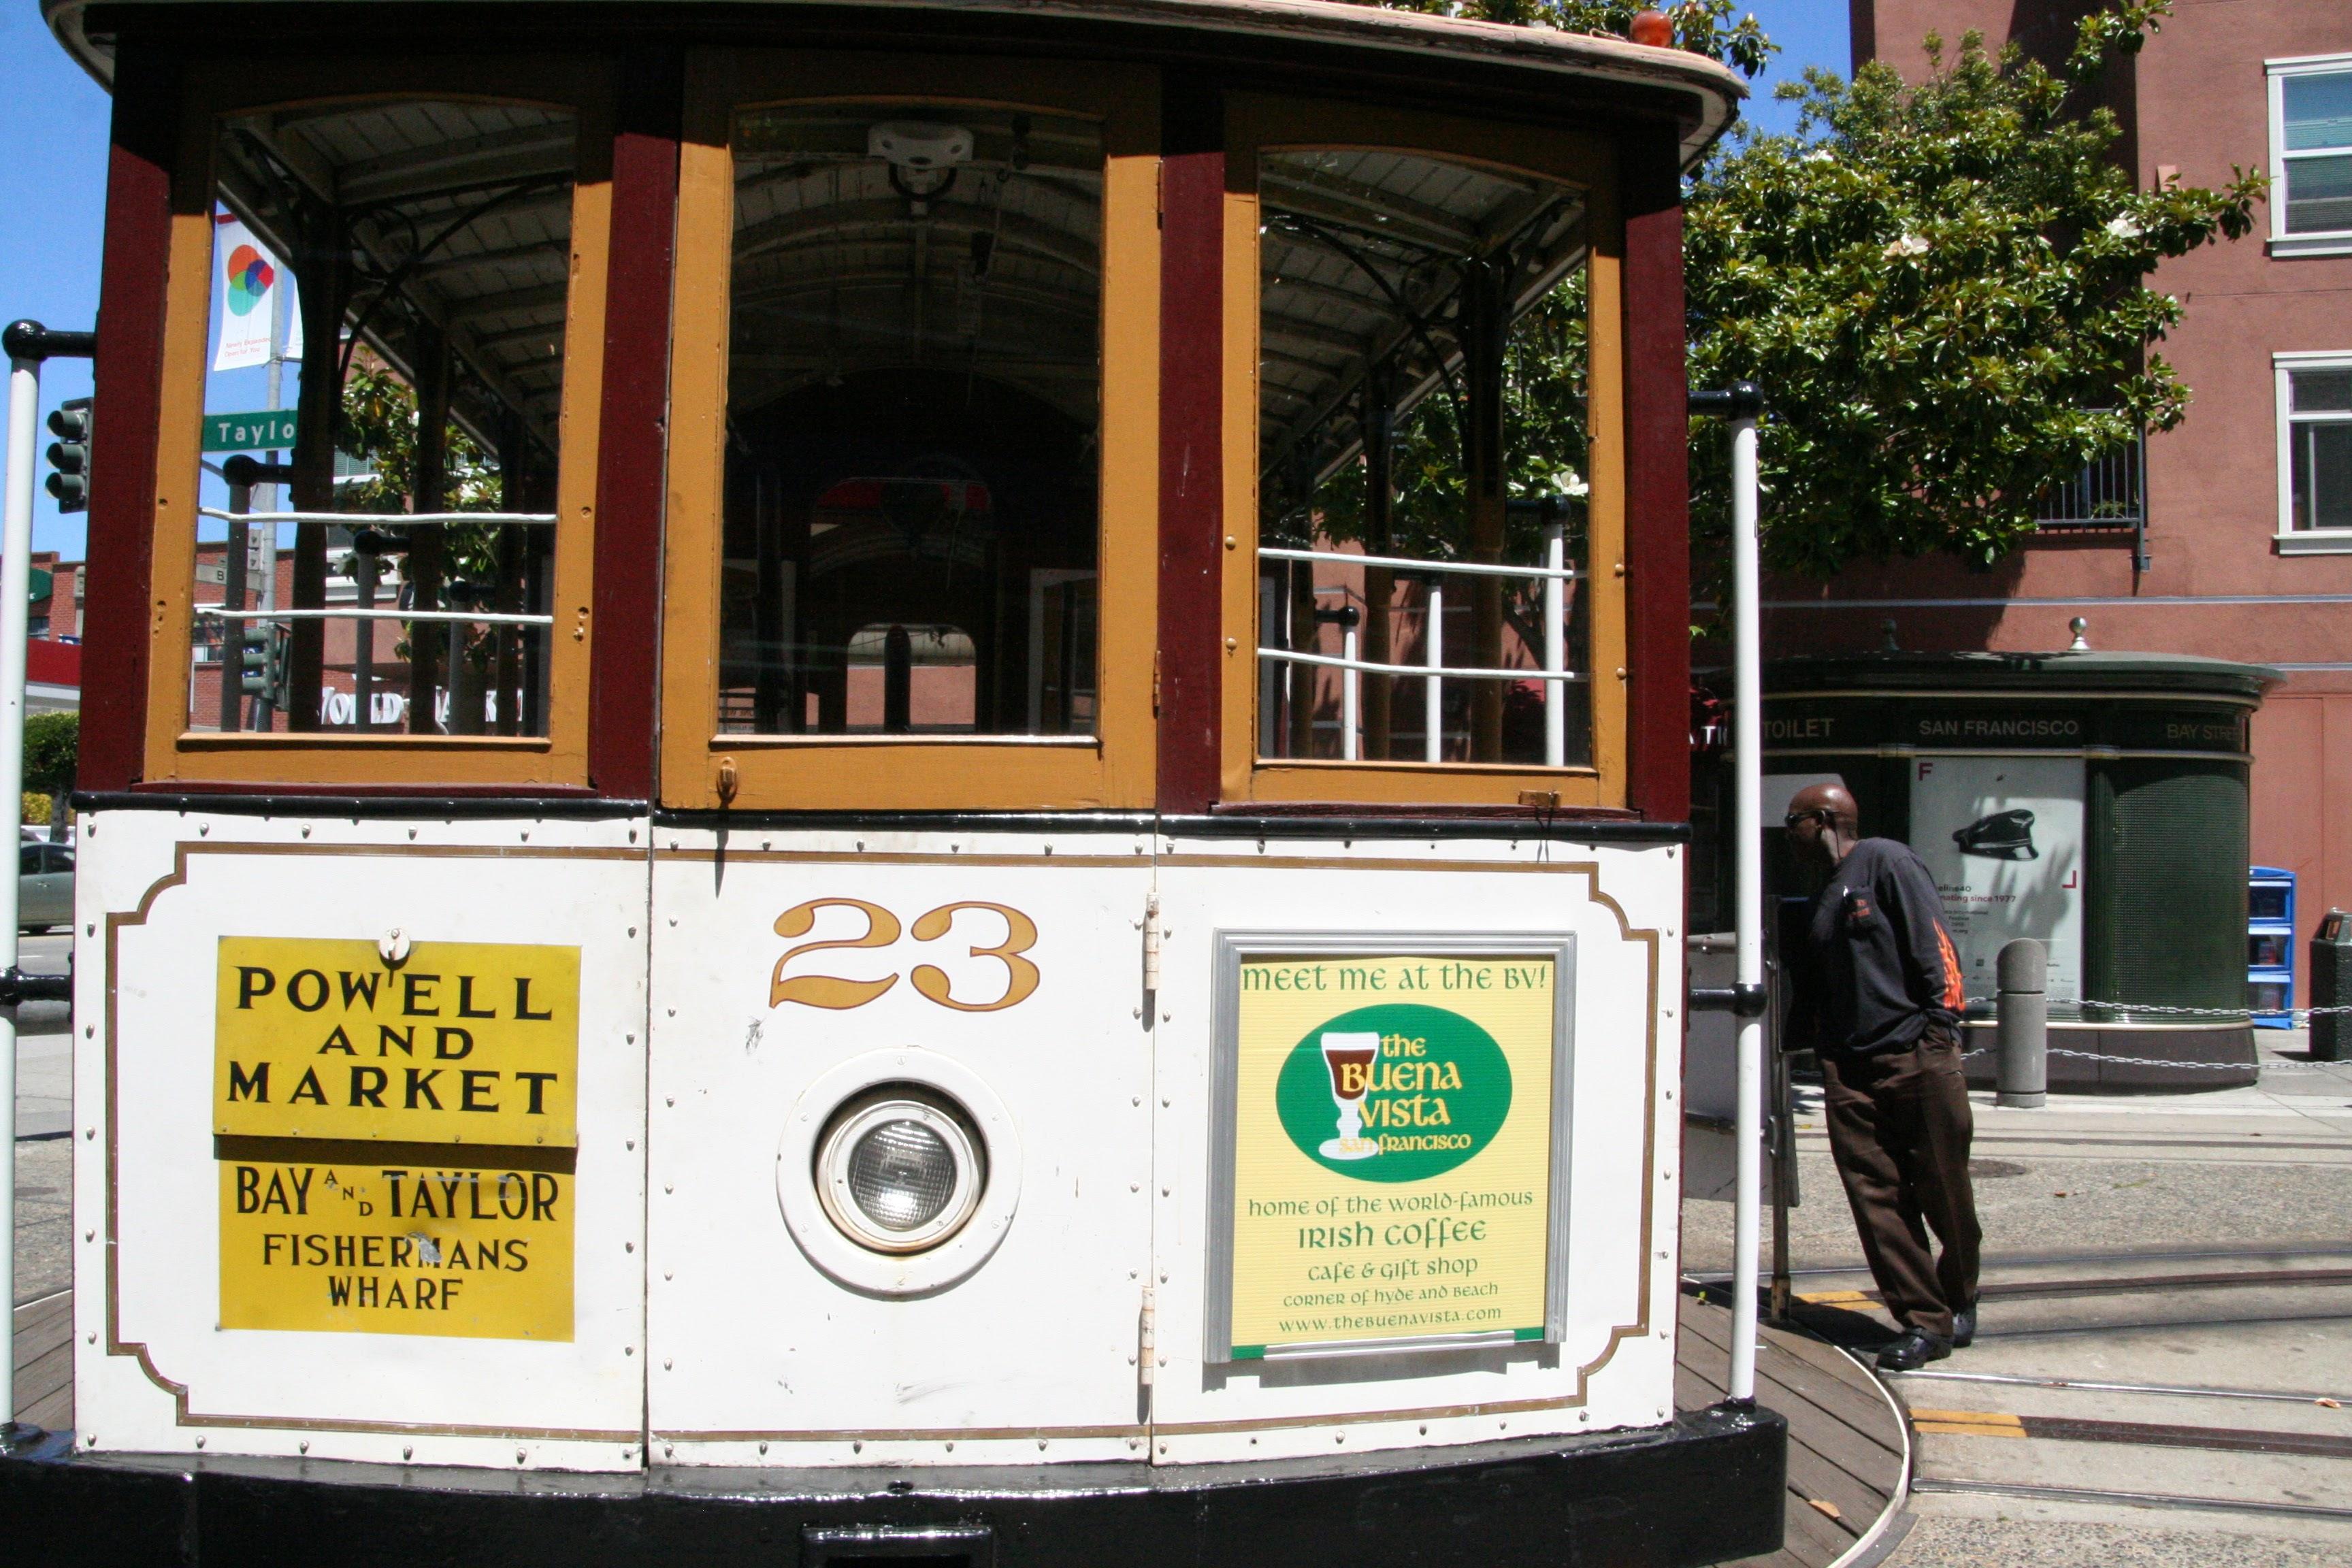 San Francisco - San Francisco cable car system - 20160714142148.jpg